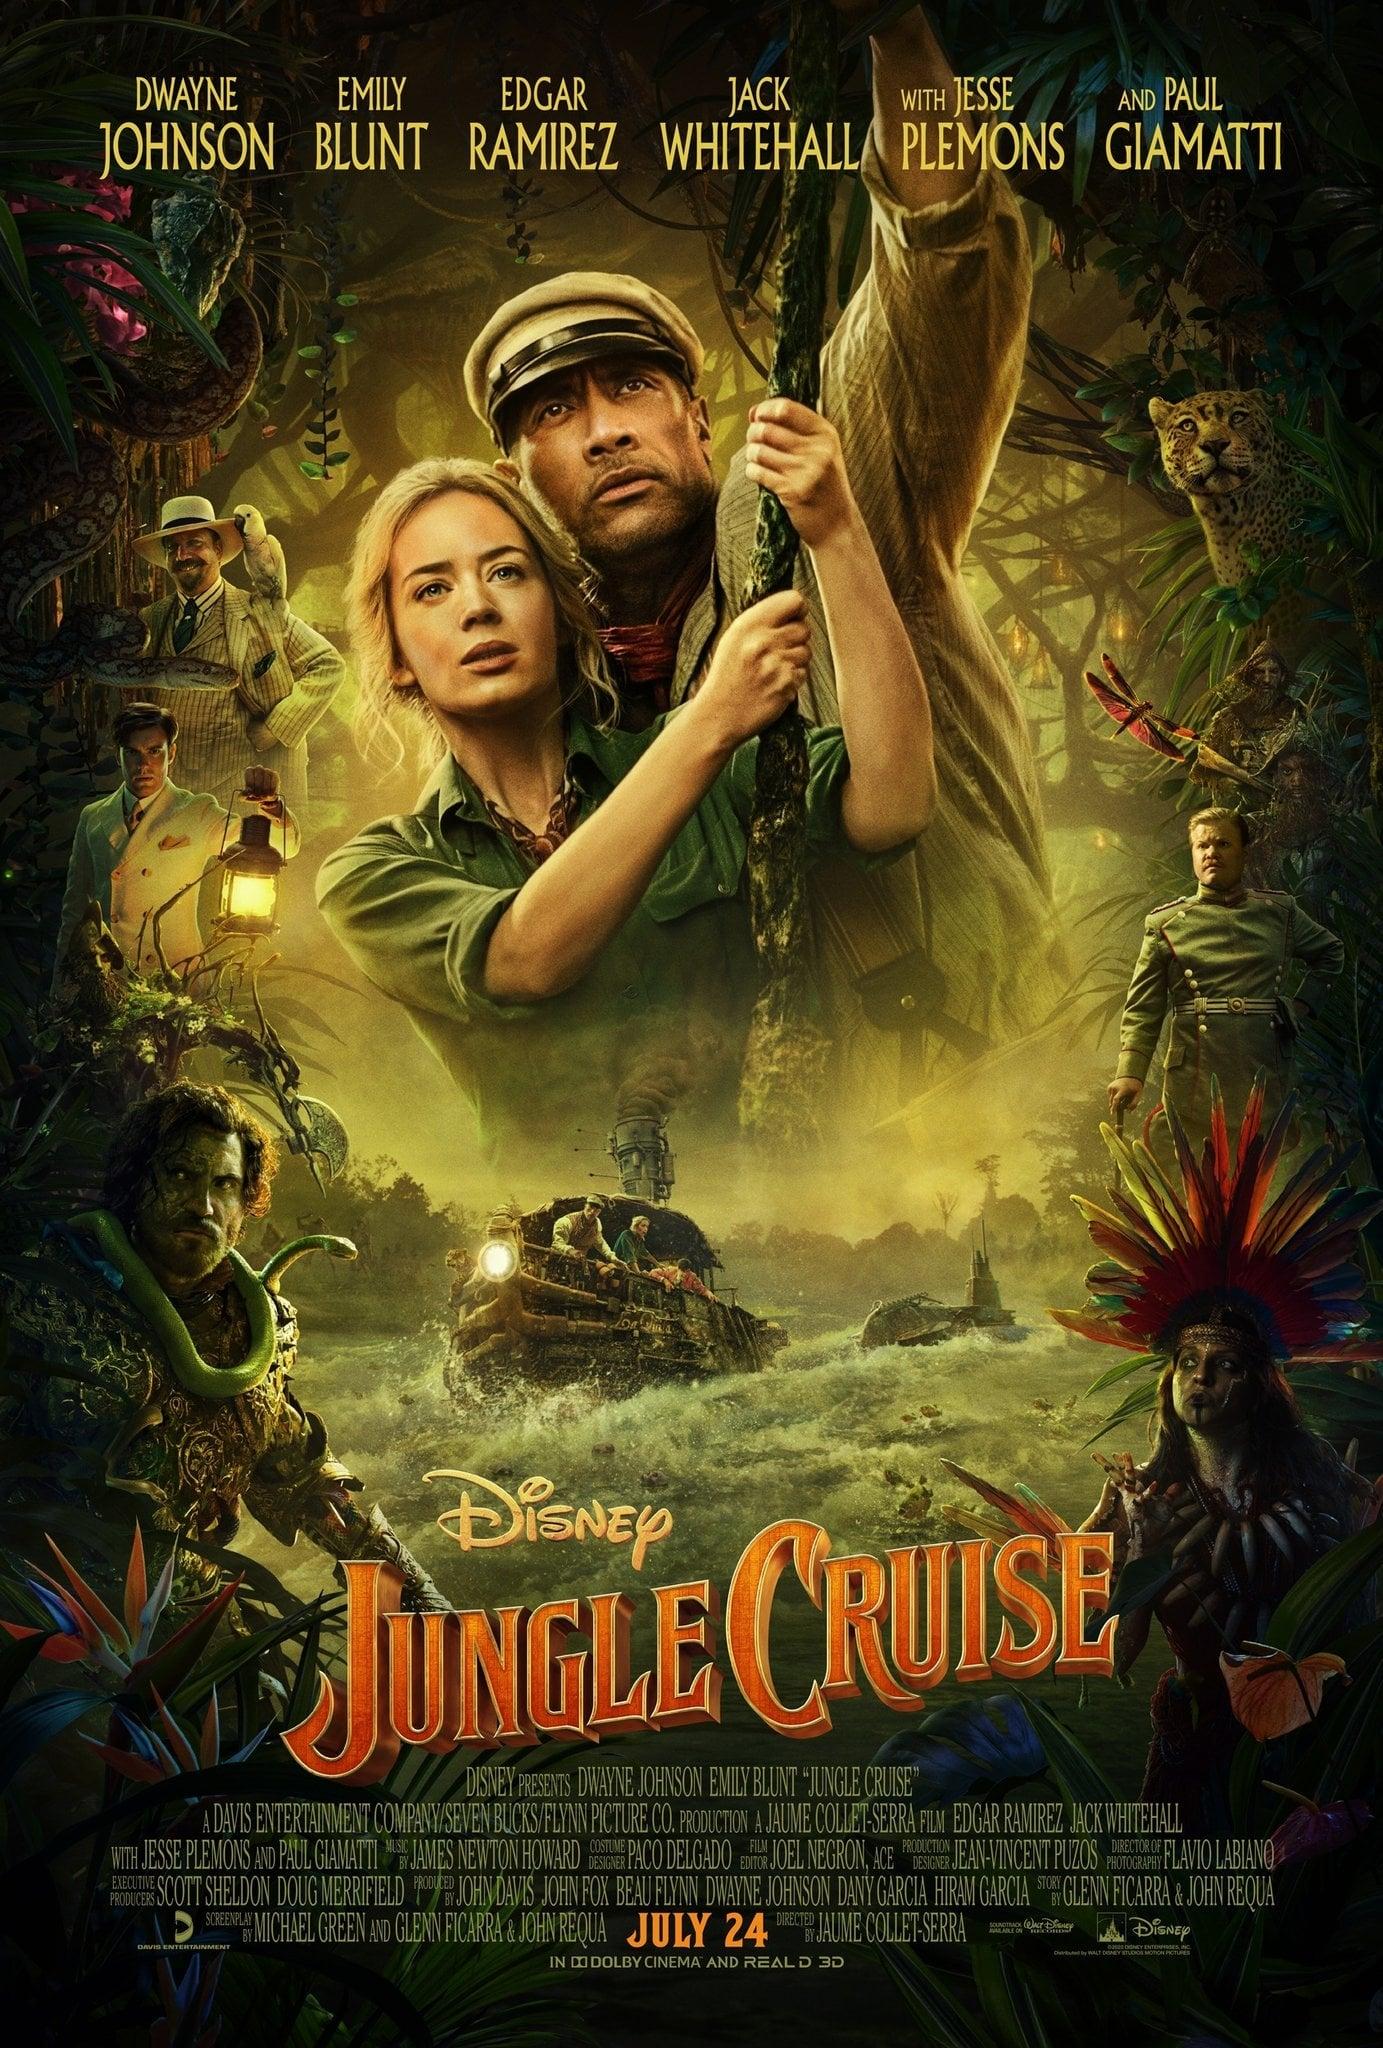 Jungle.Cruise.2021.1080p.WEB-DL.Atmos.DDP5.1.x264-EVO